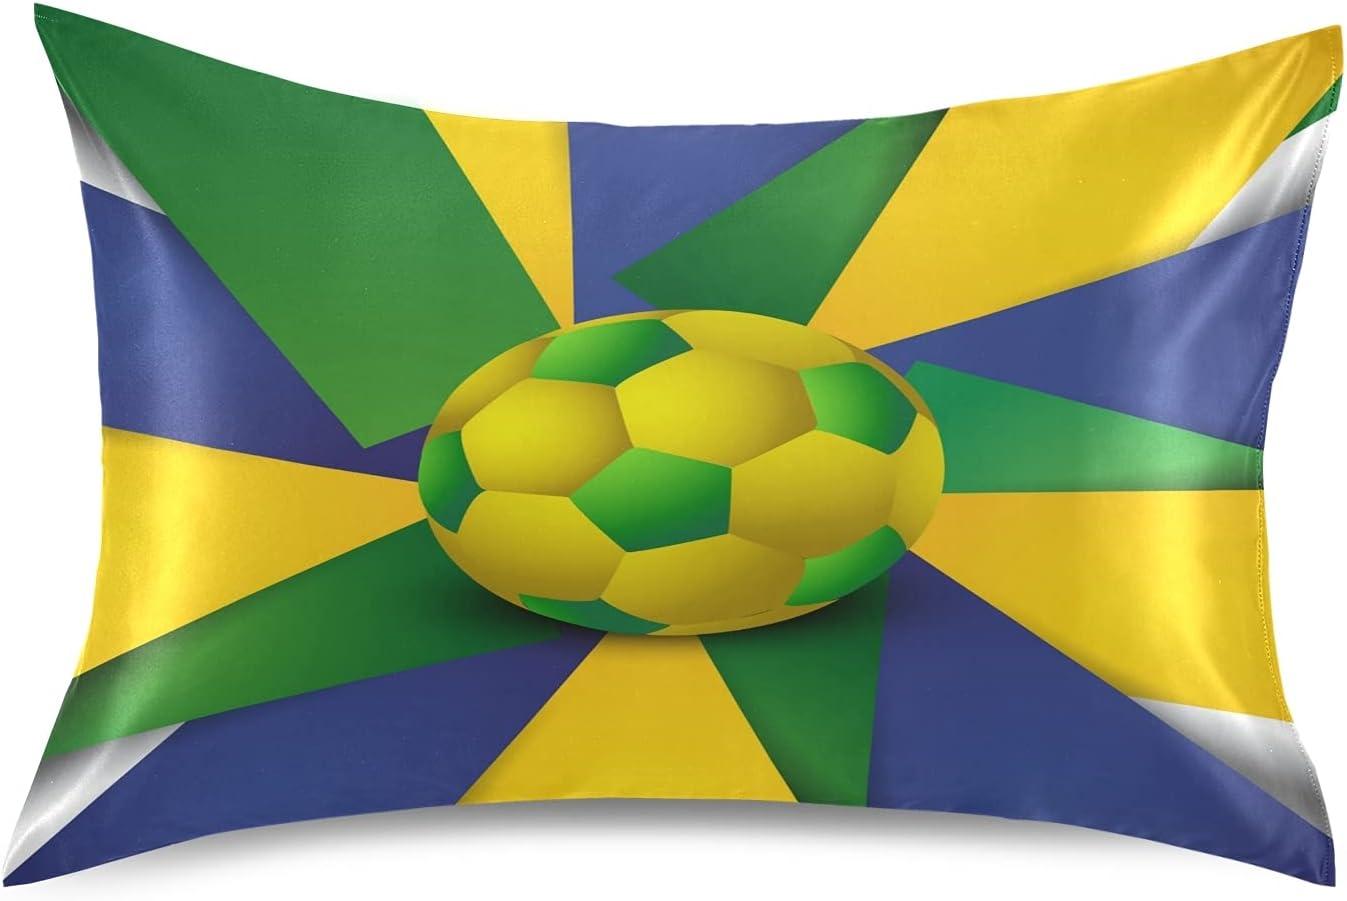 Art Max 50% OFF Sport Soccer Football Pillowcase Soft Case supreme Pro Covers Pillow